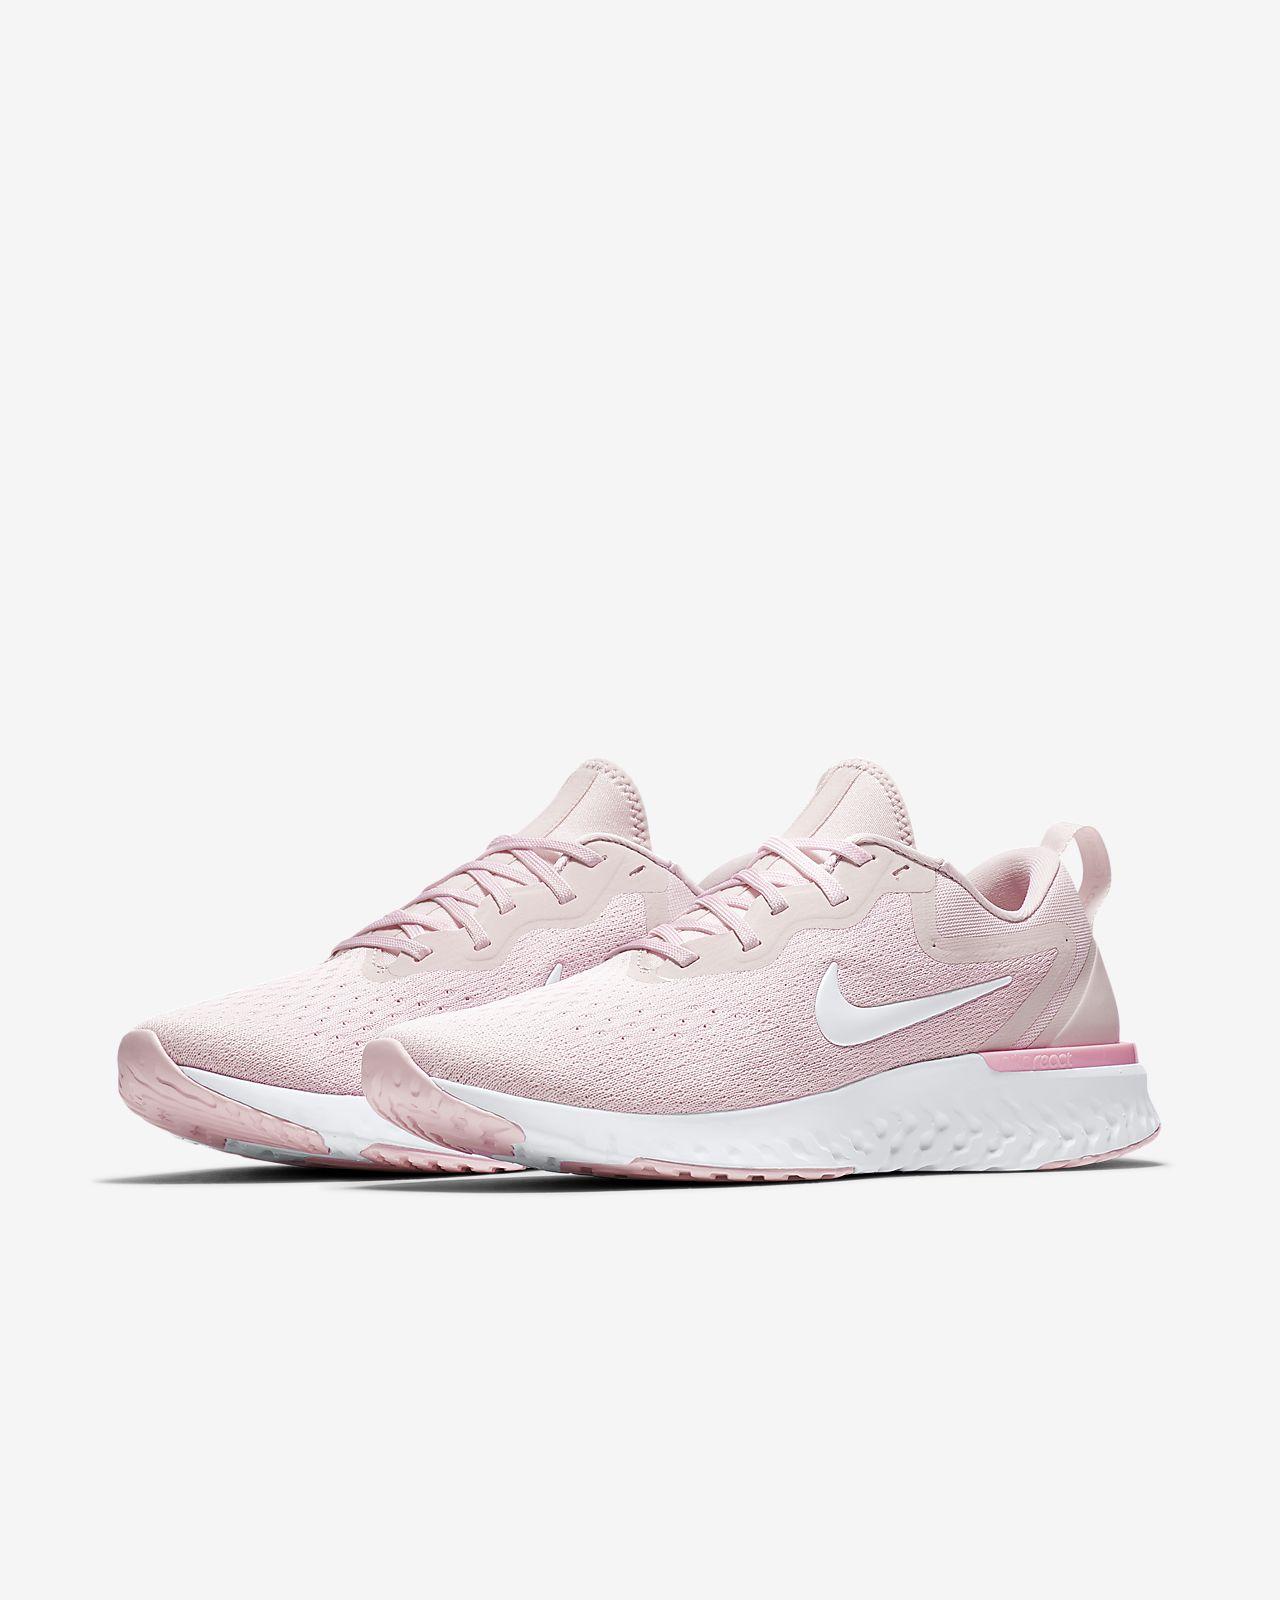 3508d10ab25c0 Nike Odyssey React Women's Running Shoe. Nike.com SG